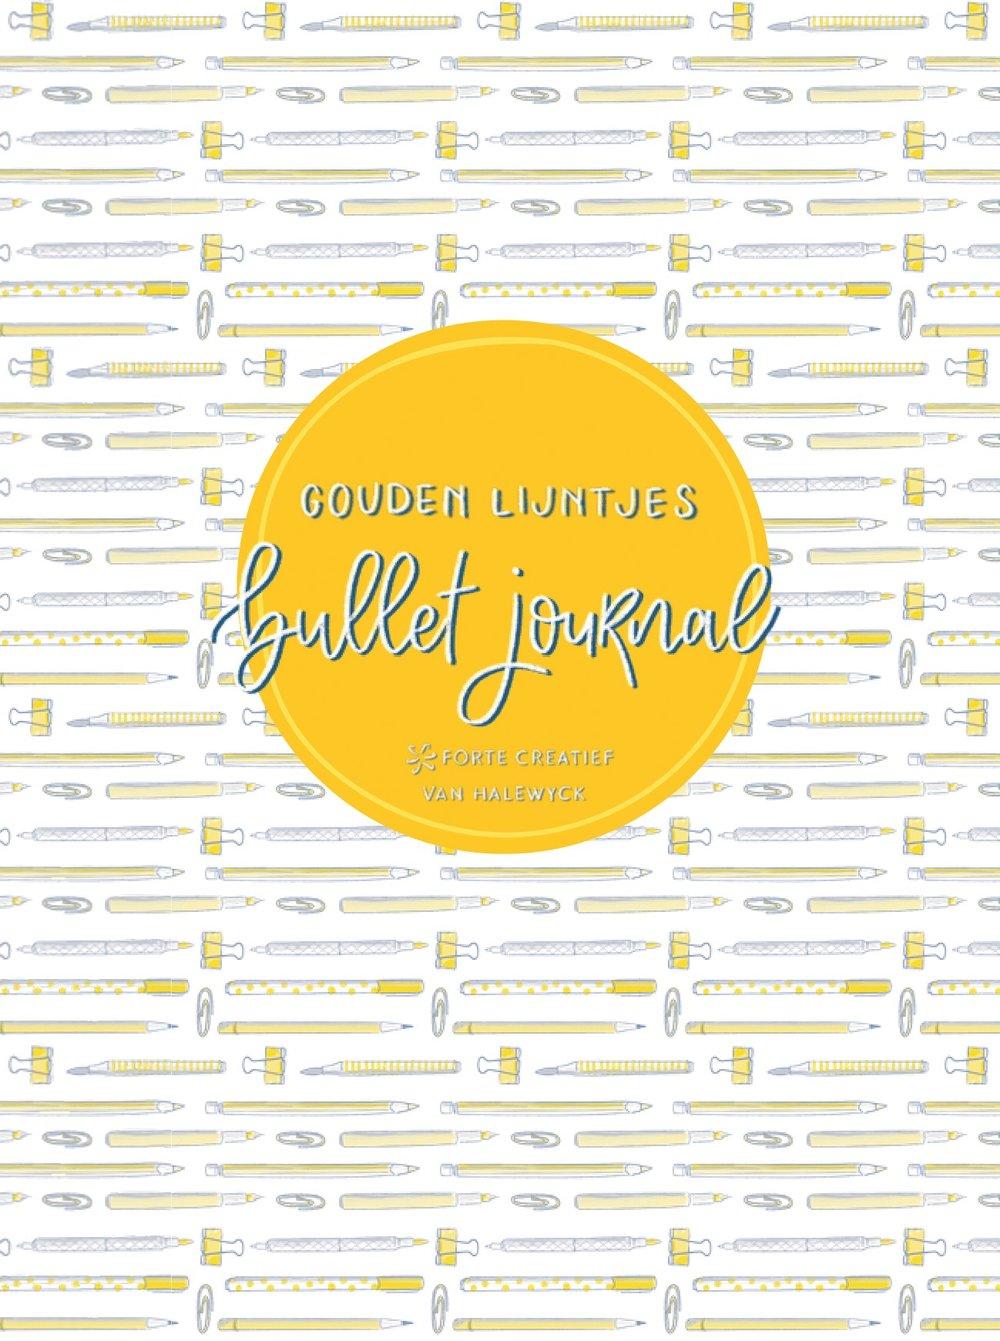 Gouden_Lijntjes_bullet_journal